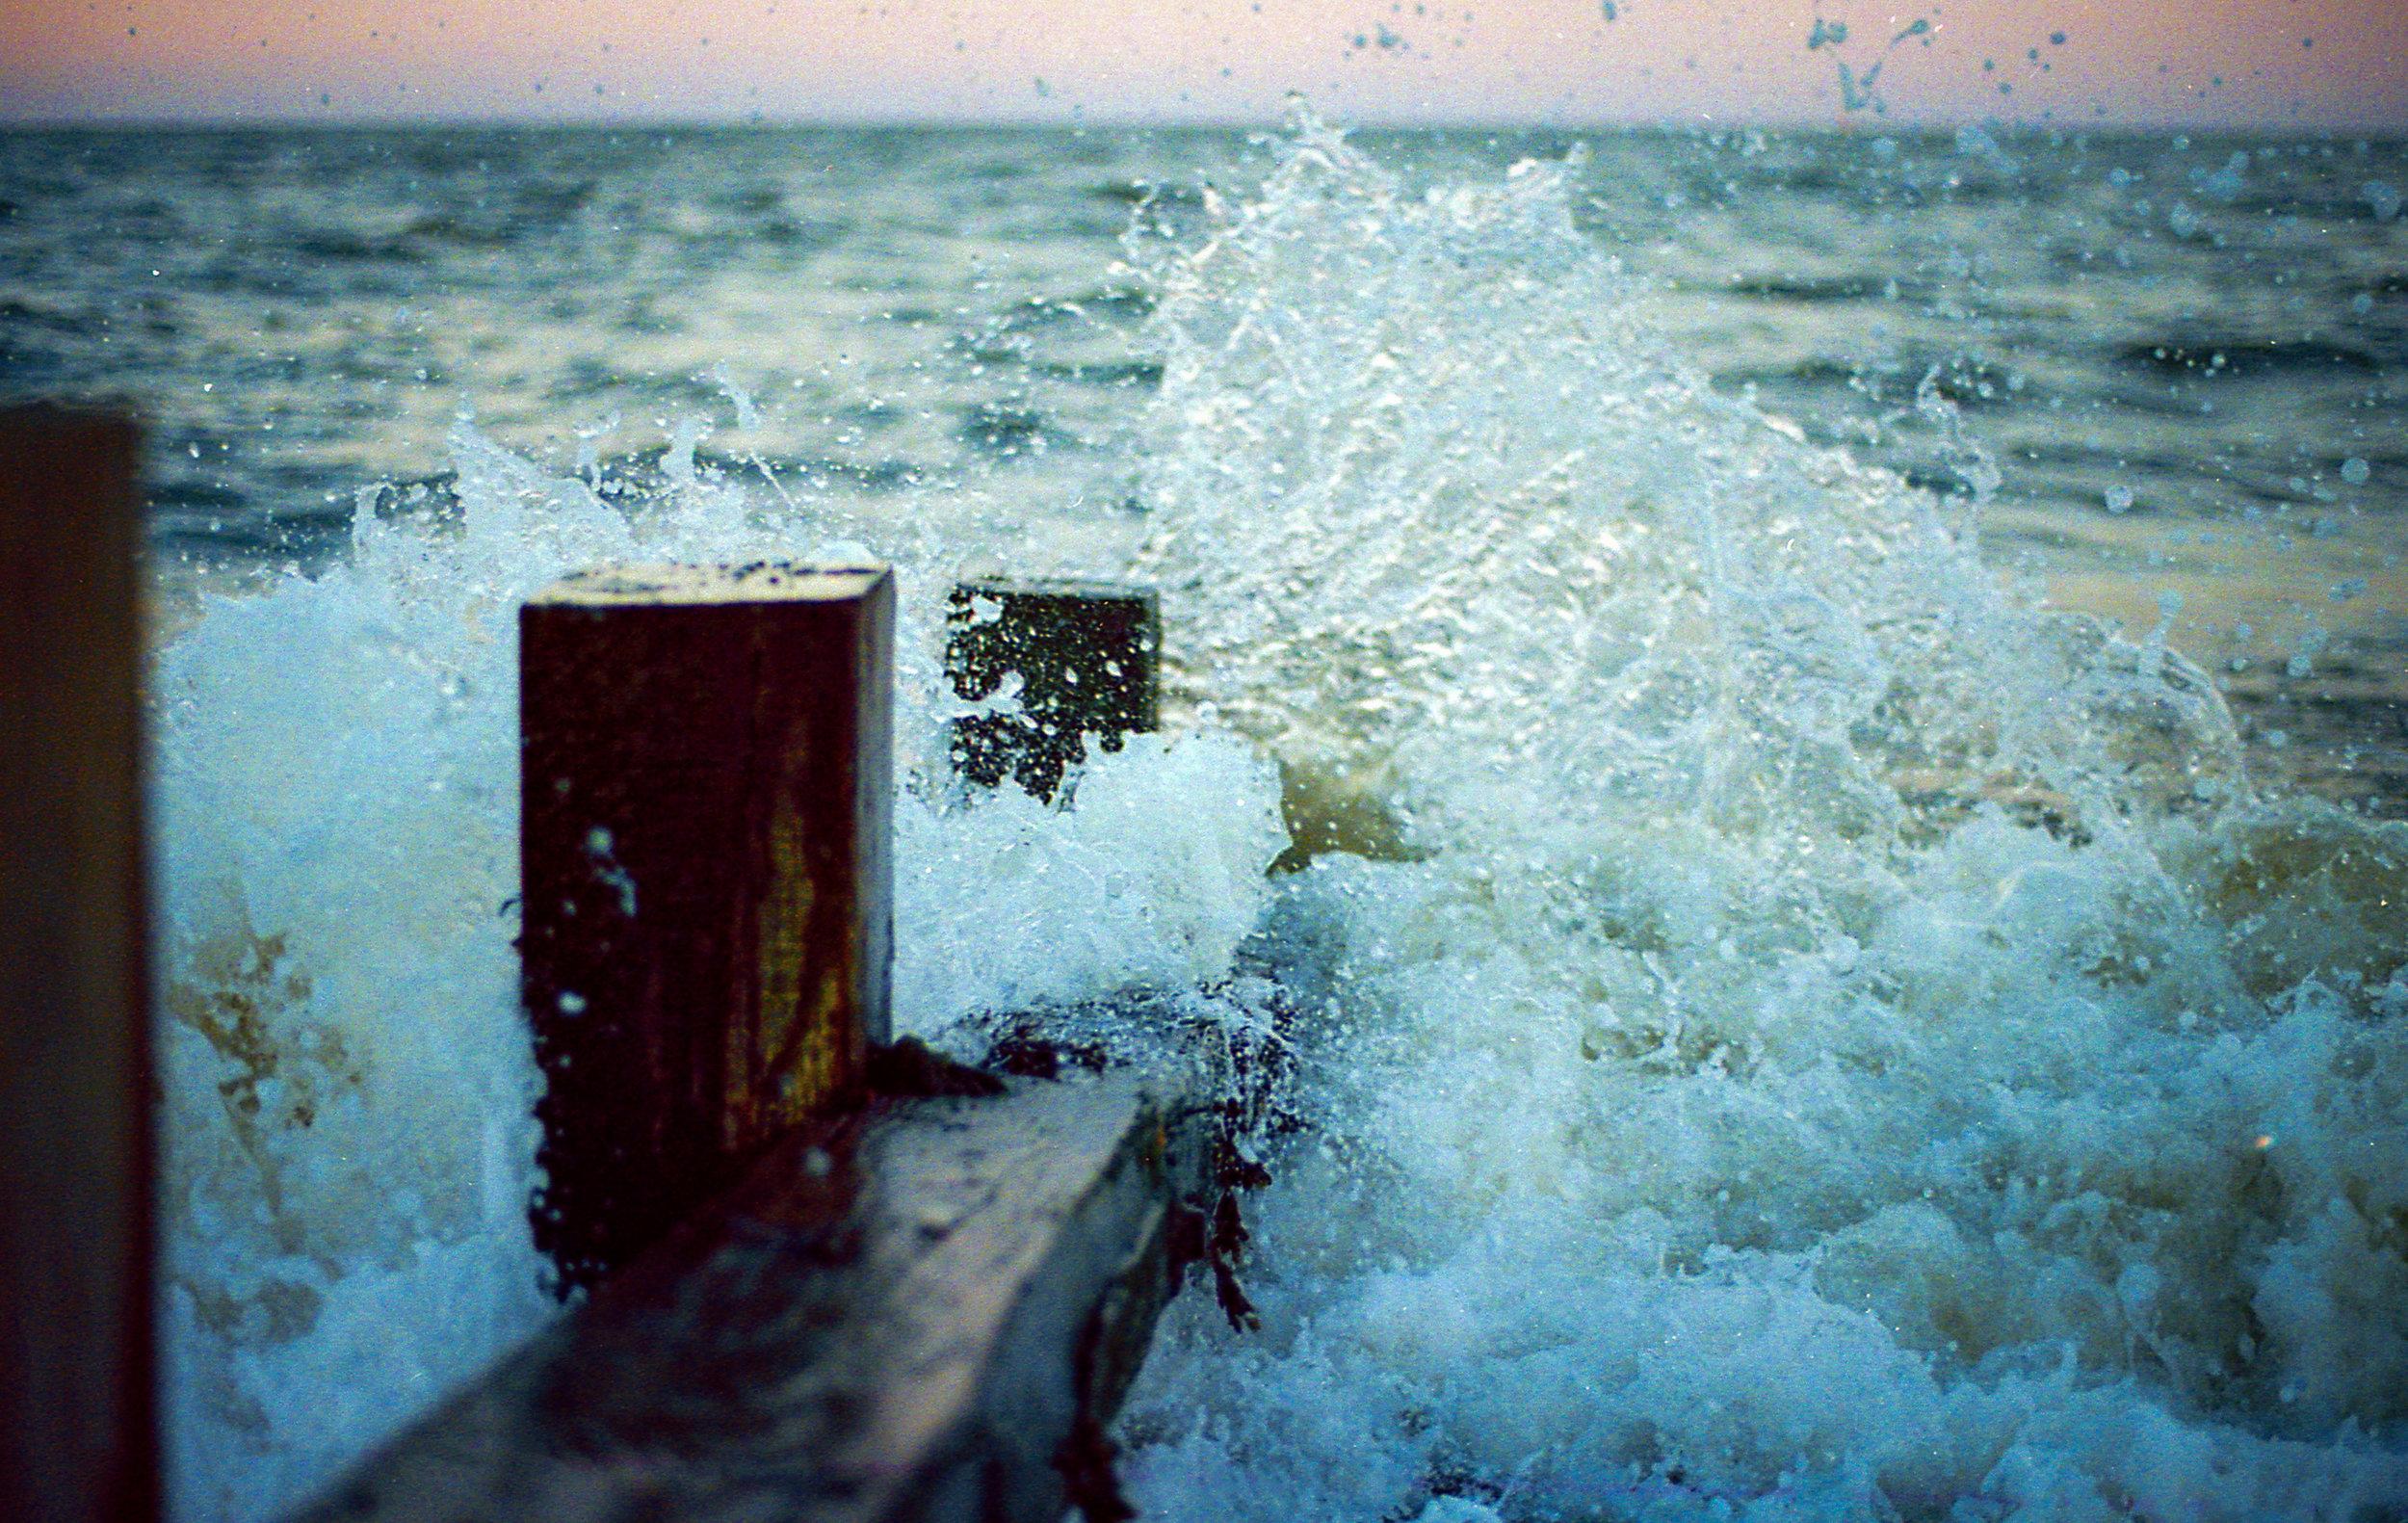 Wave Breaking, 35mm film, 2018